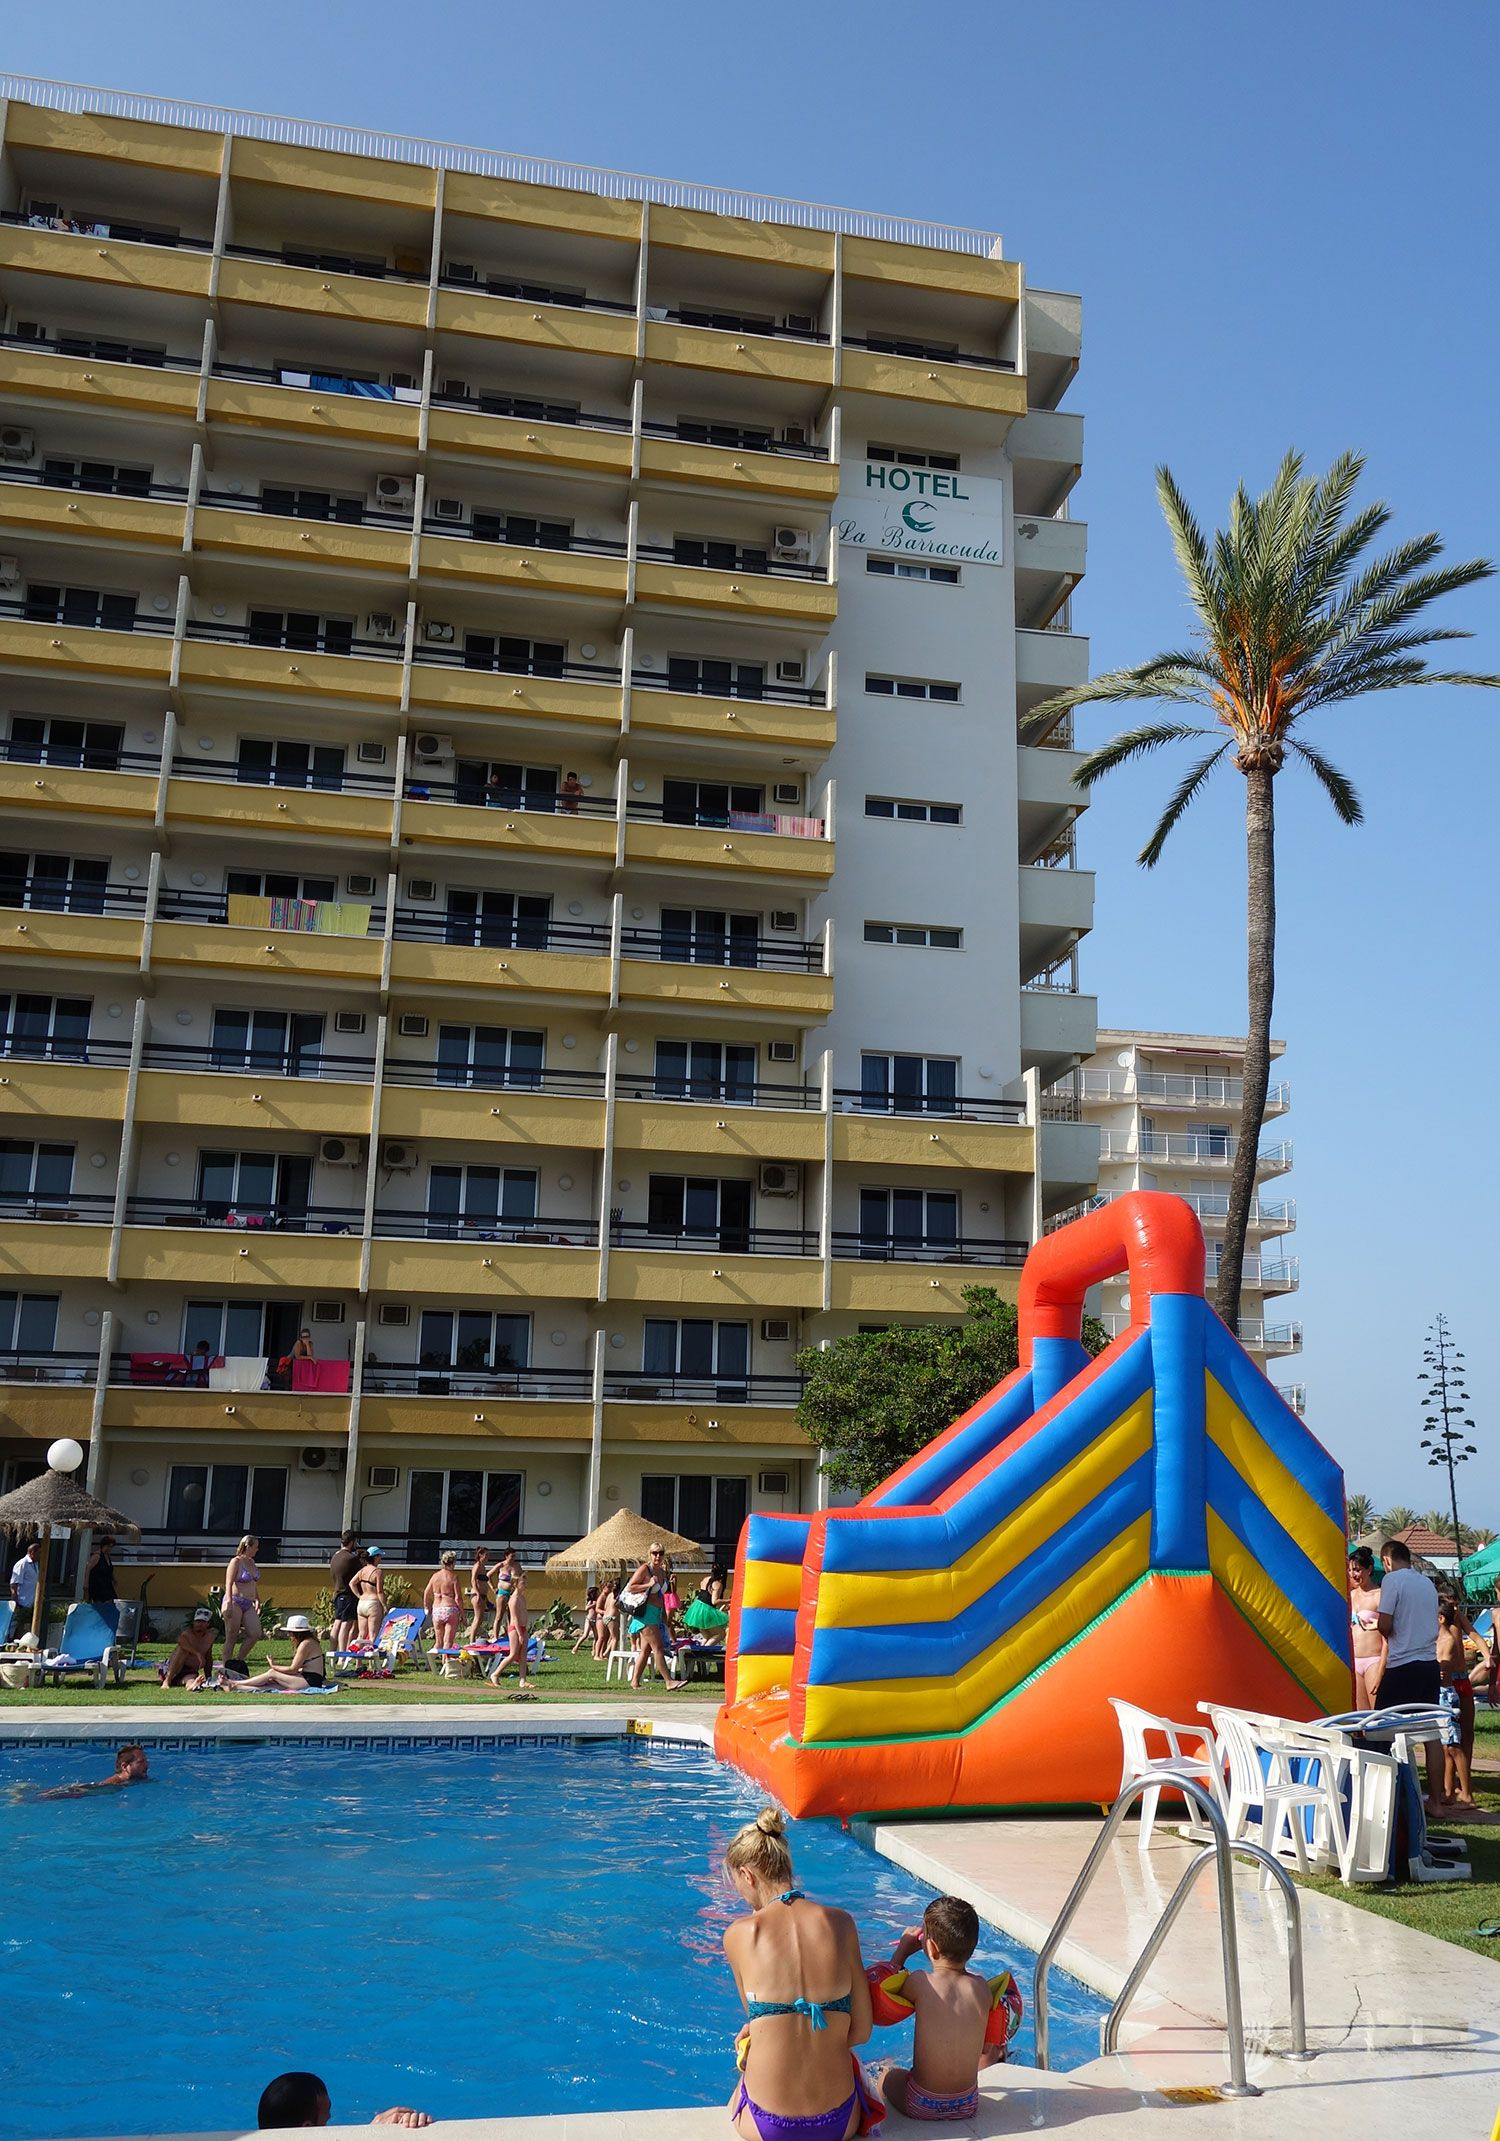 Juegos de vacaciones en la piscina for Jocs de piscina